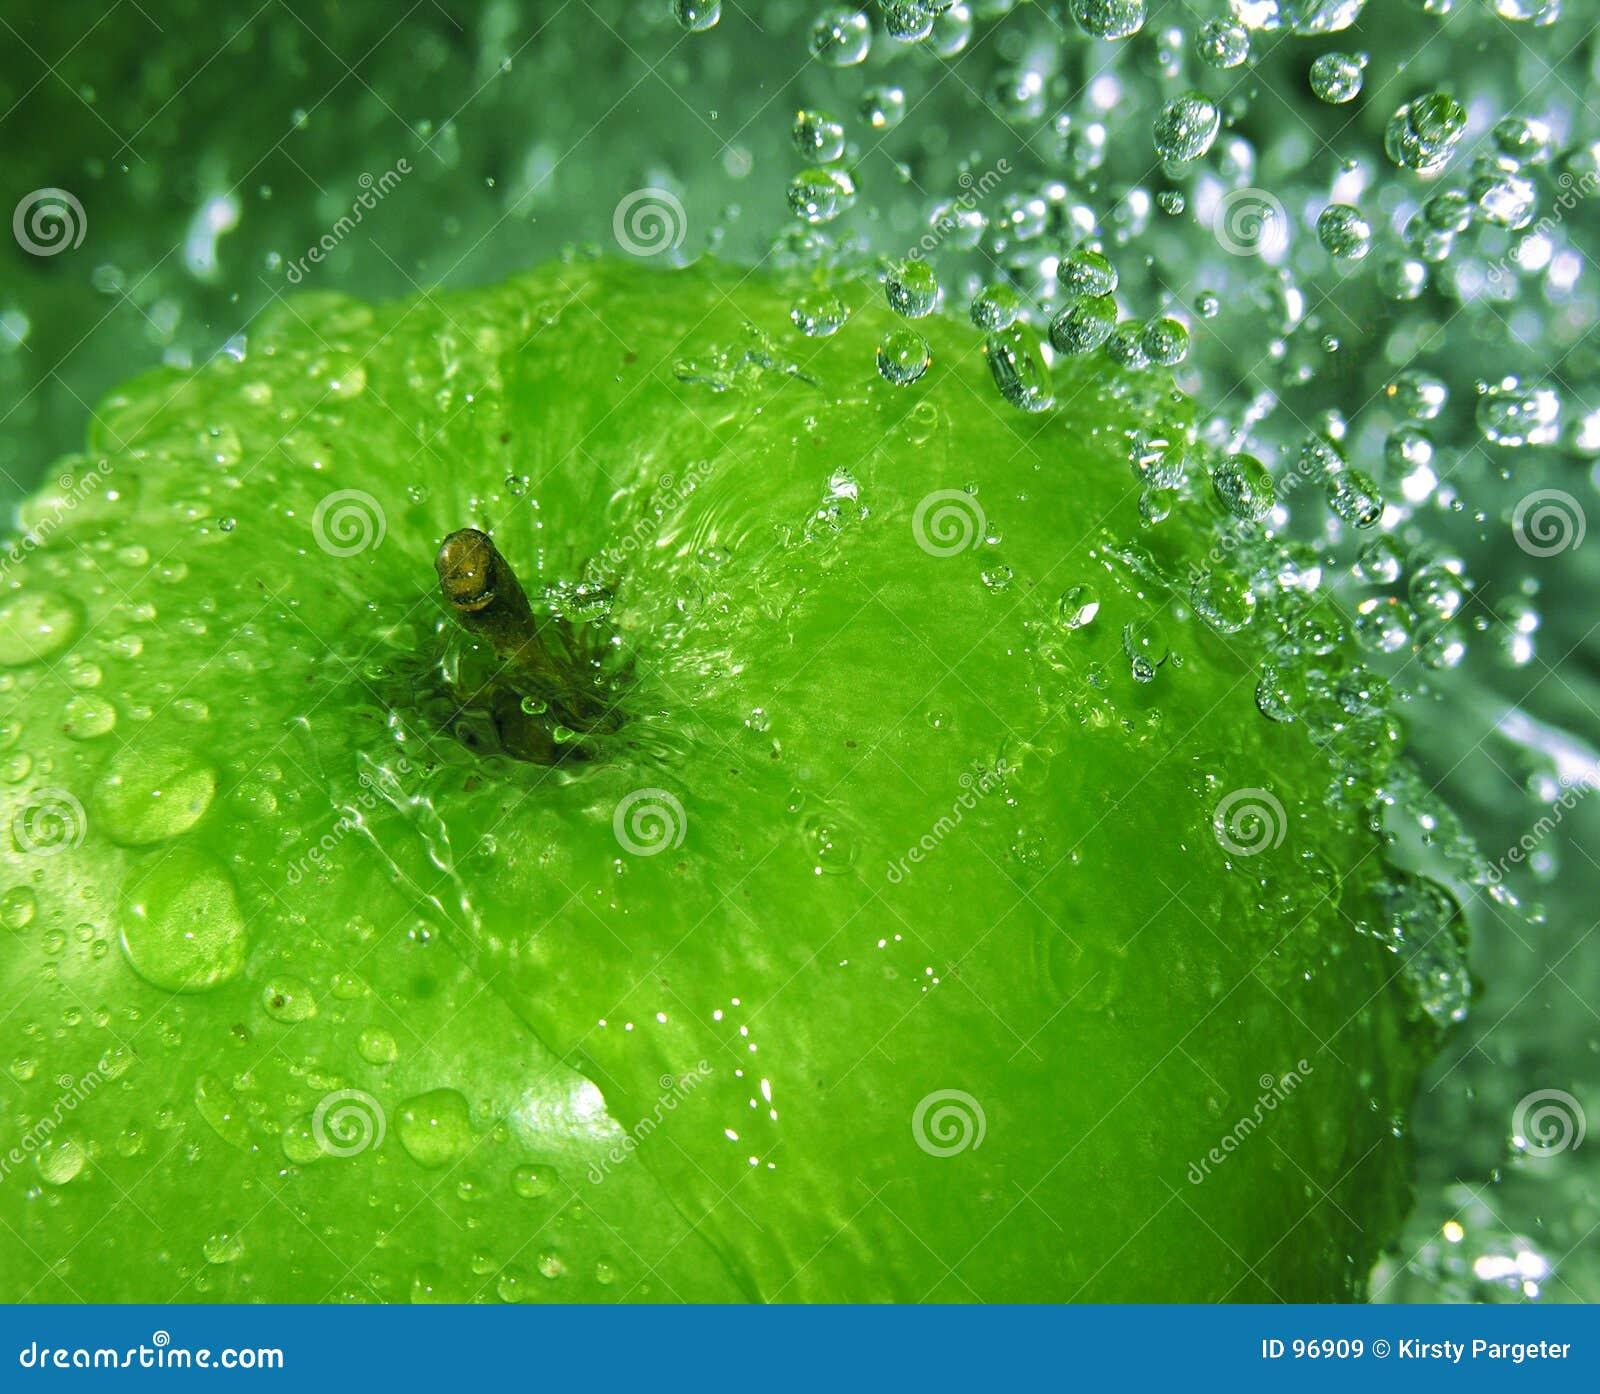 Refreshing Apple Royalty Free Stock Images - Image: 96909